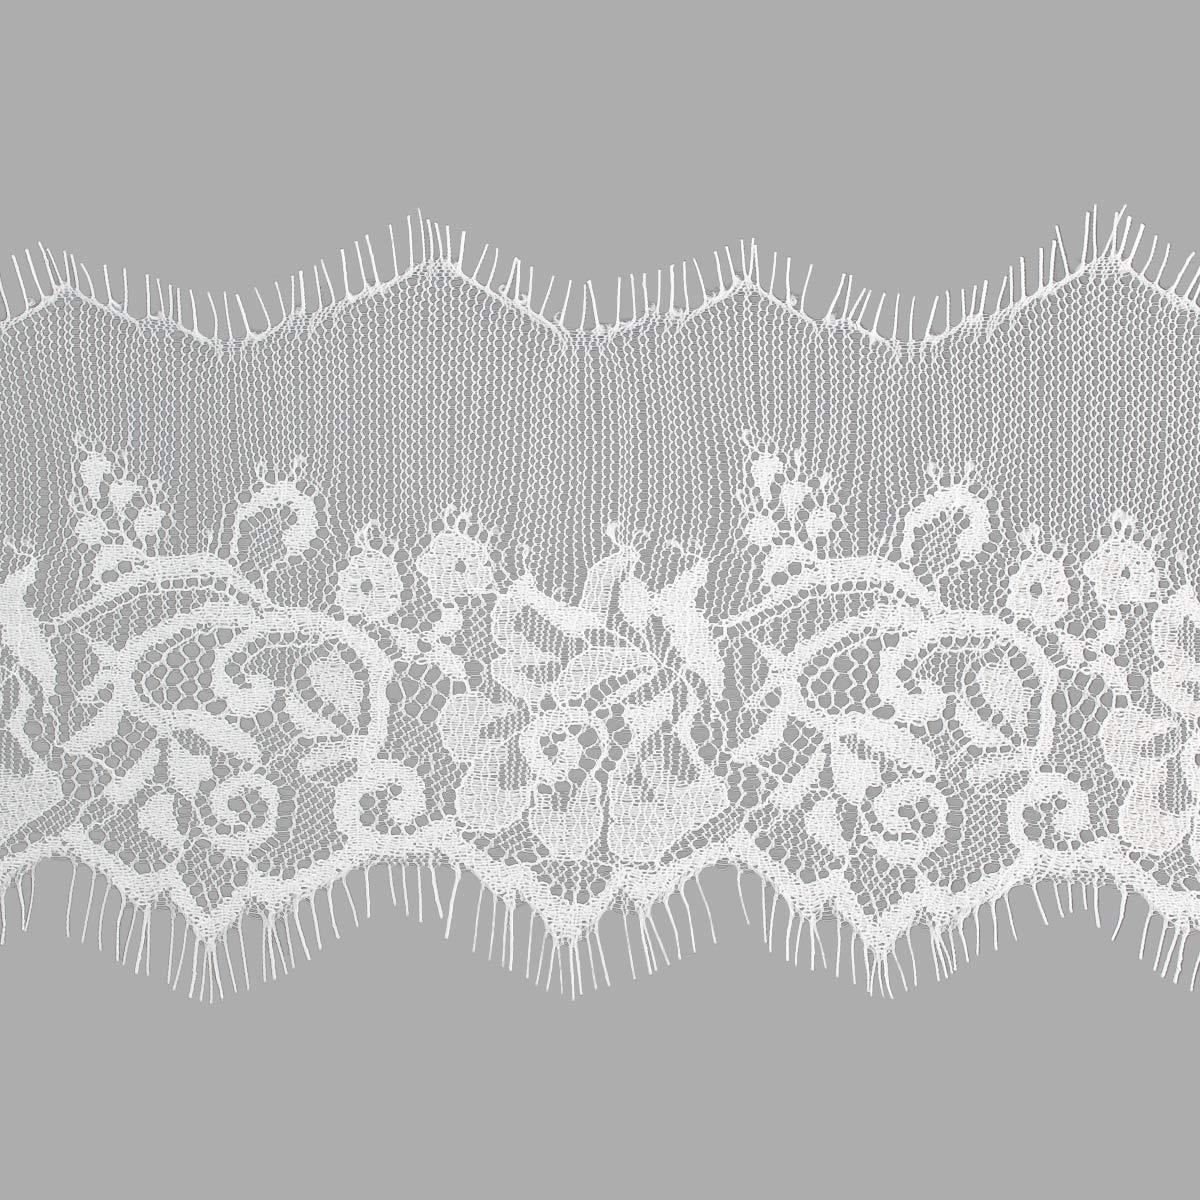 SJ053 Кружево 'Шантильи' на сетке 10,0см*3м, белый